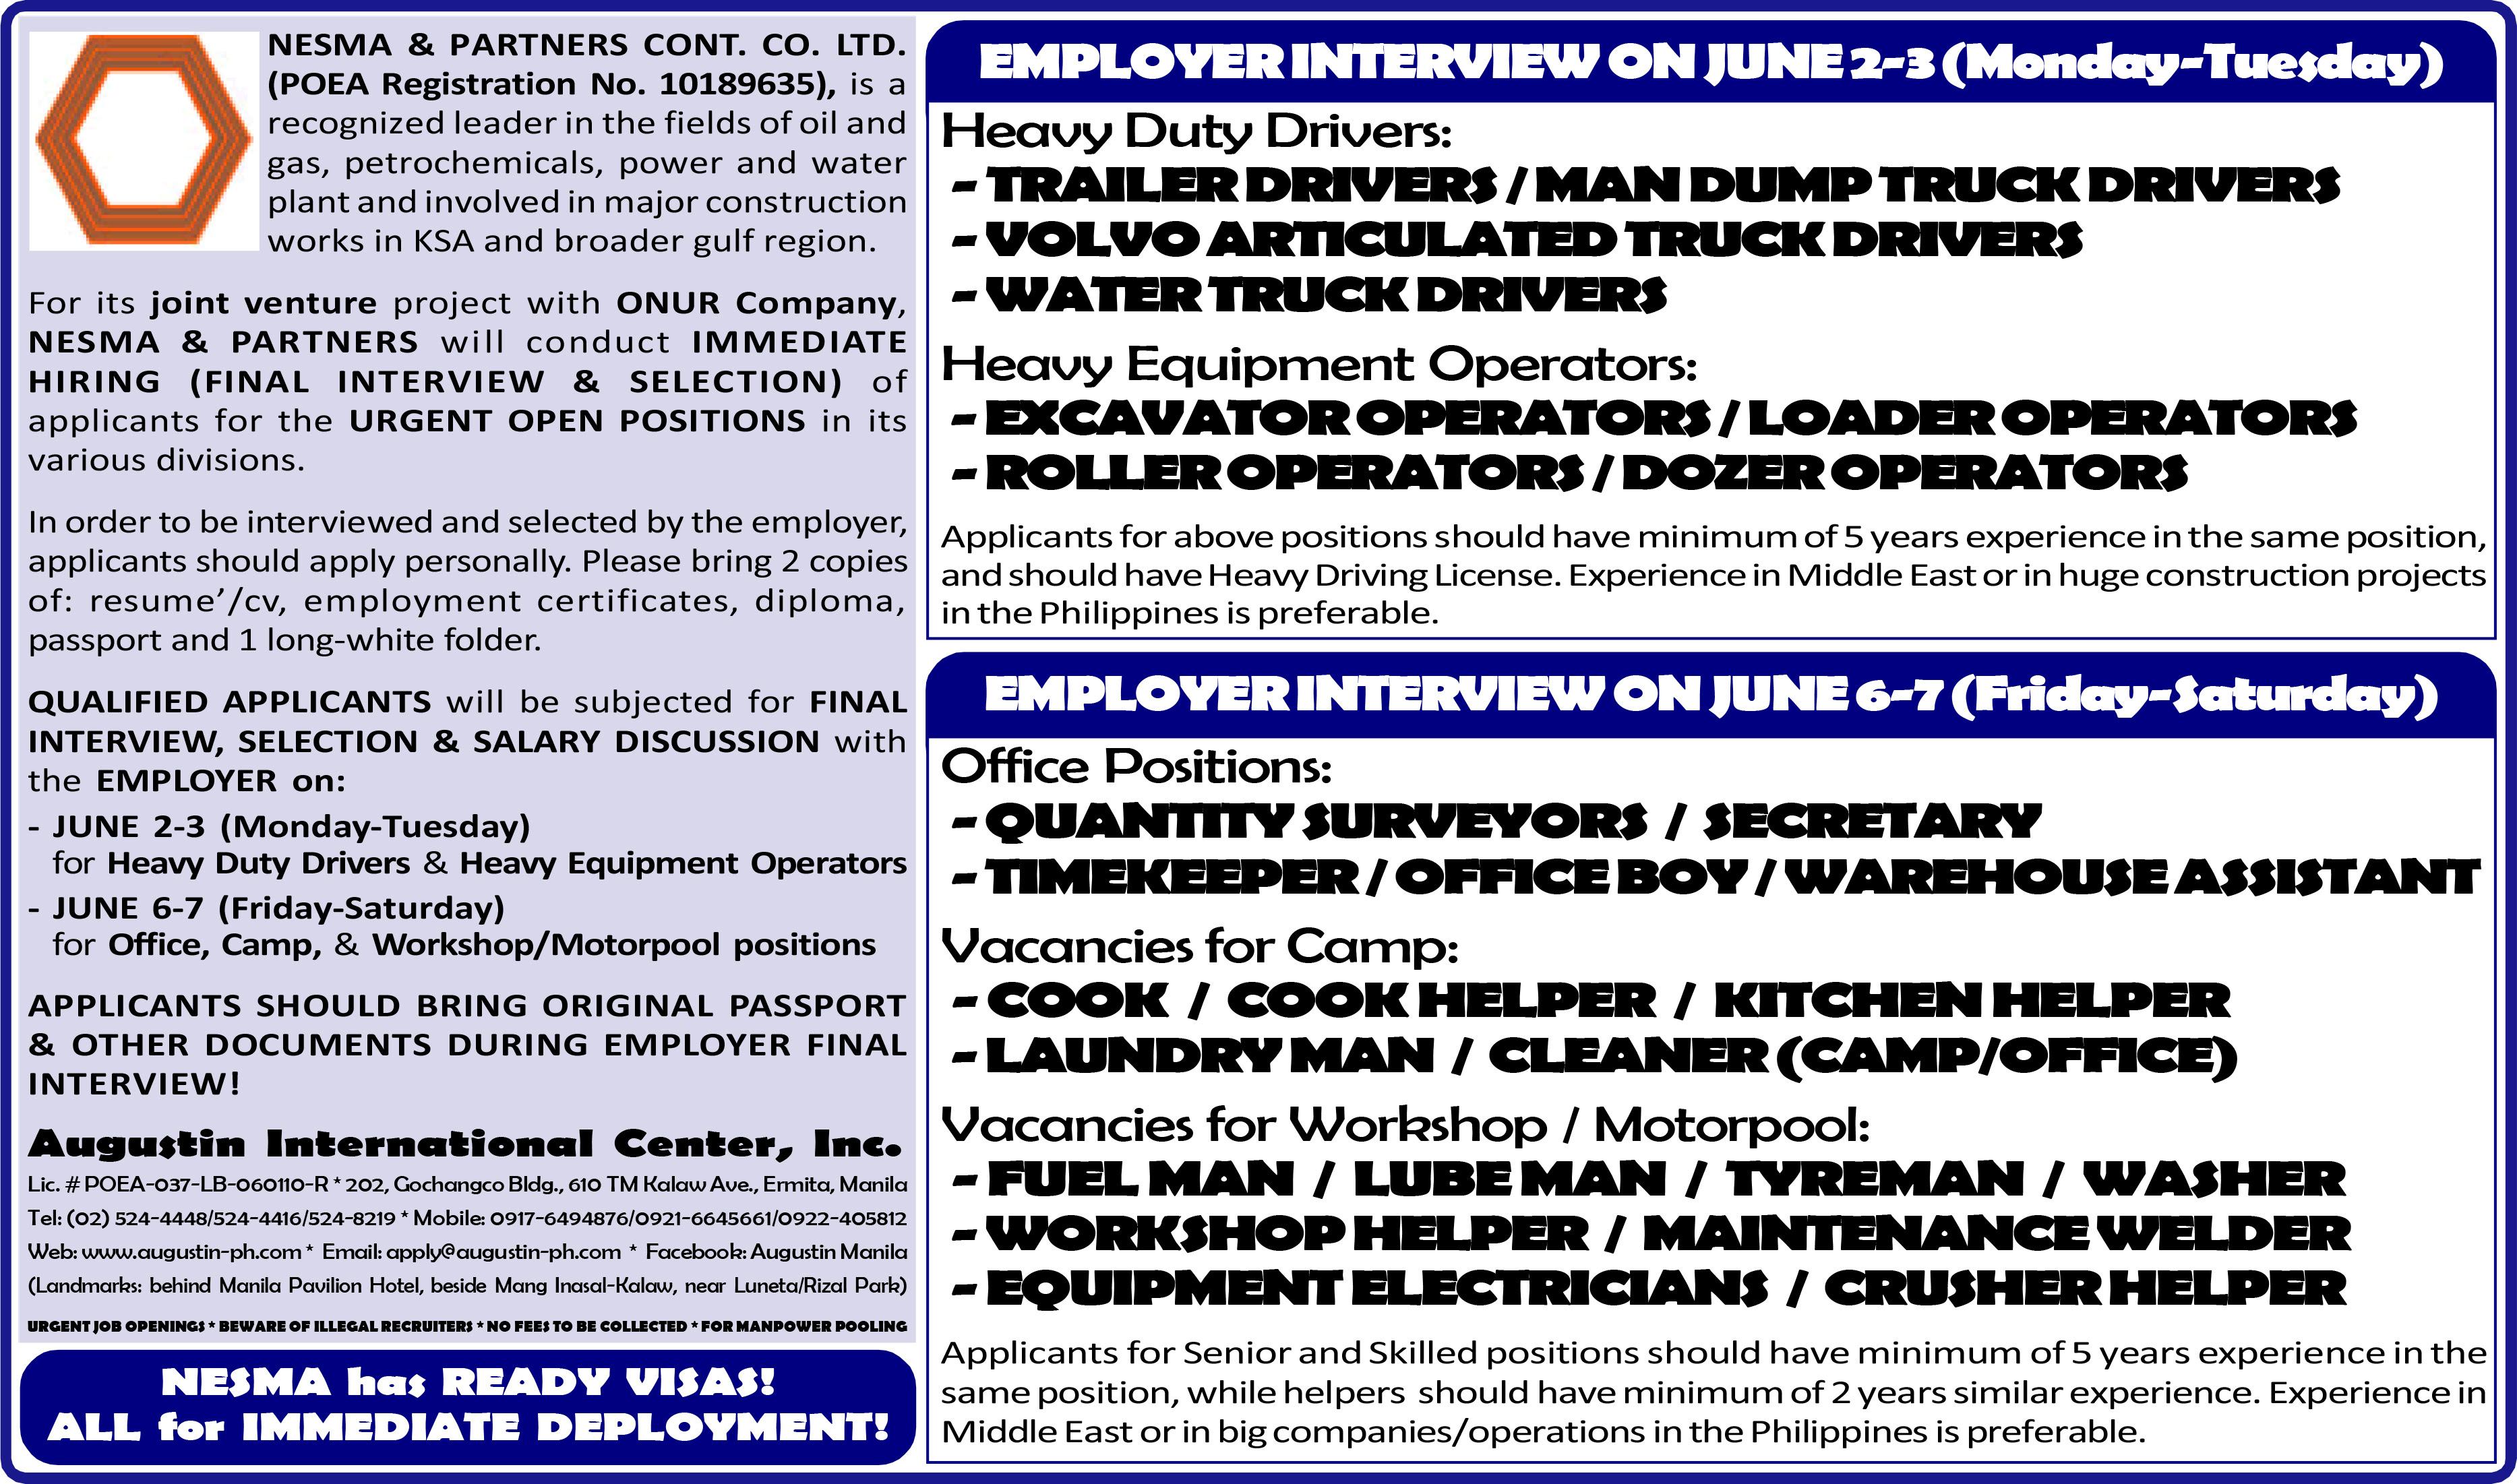 Autocad Operator Salary In Qatar - Autocad - Design Pallet